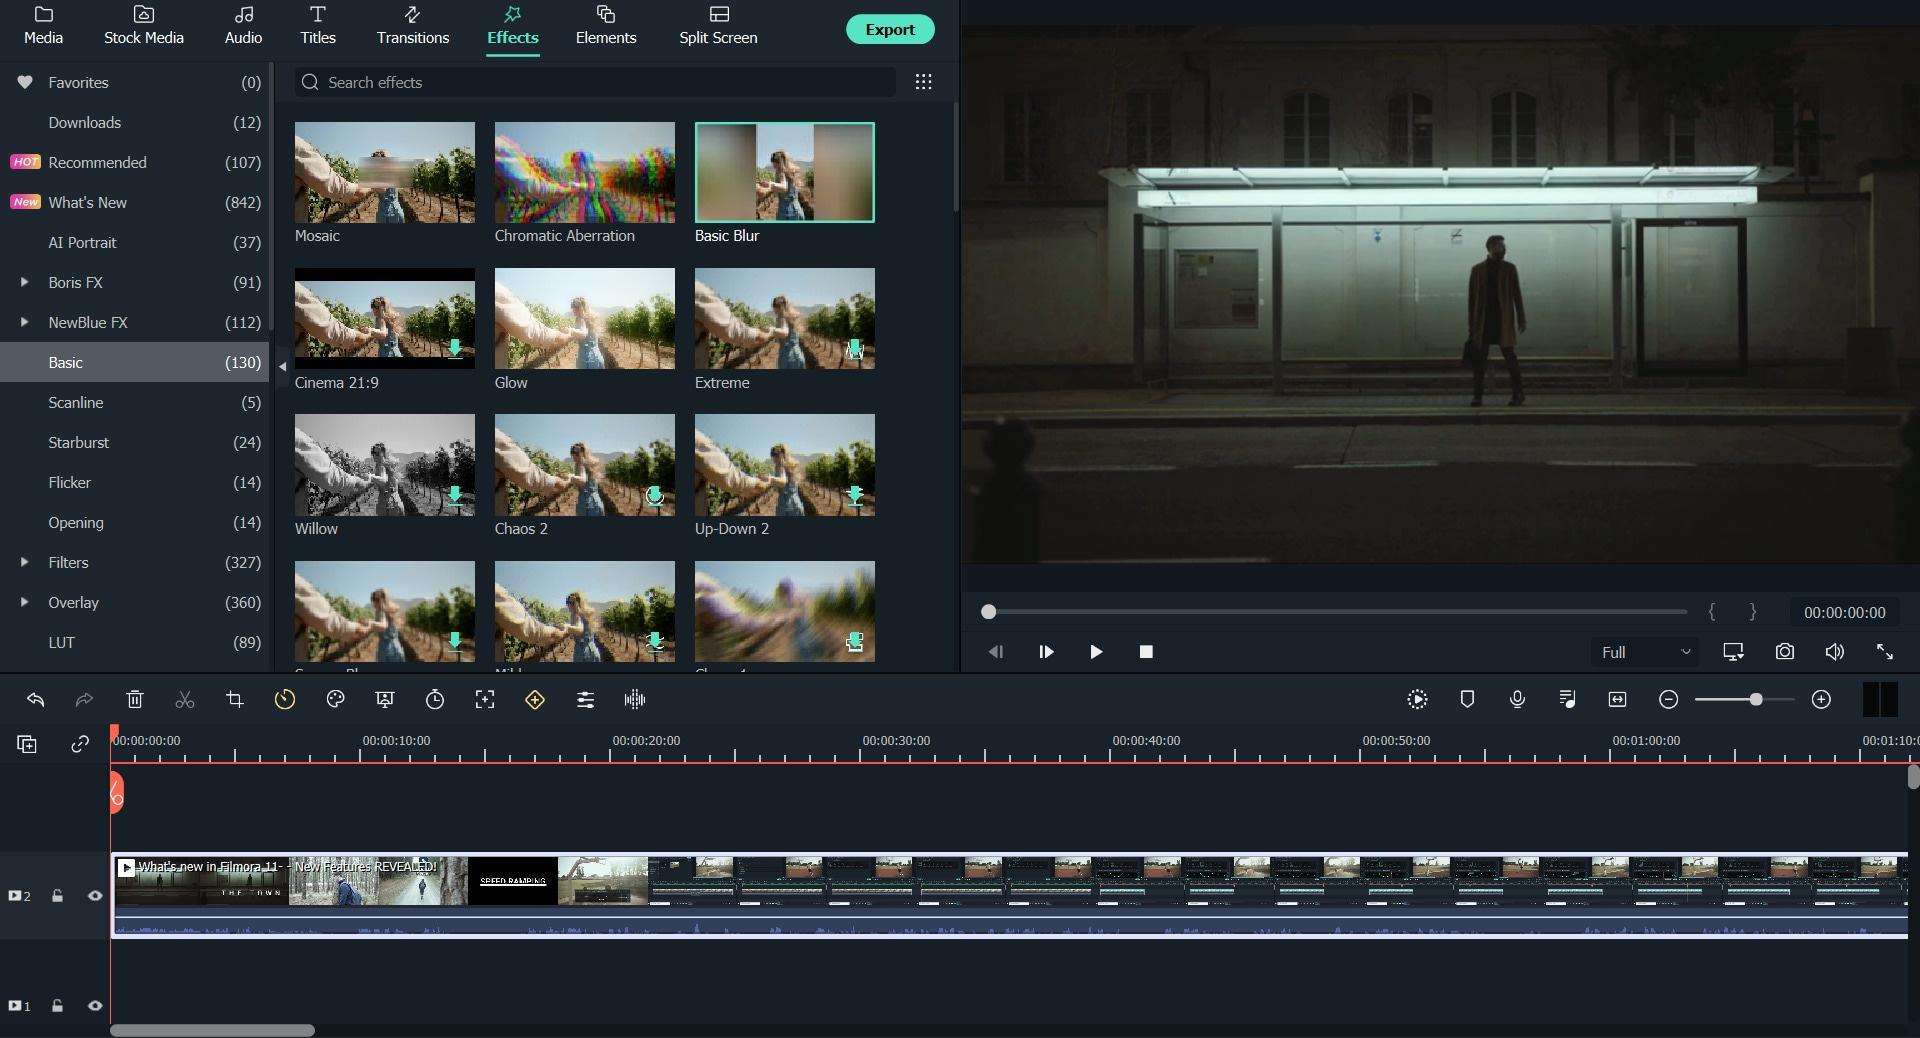 add background blur in 9:16 cropped video